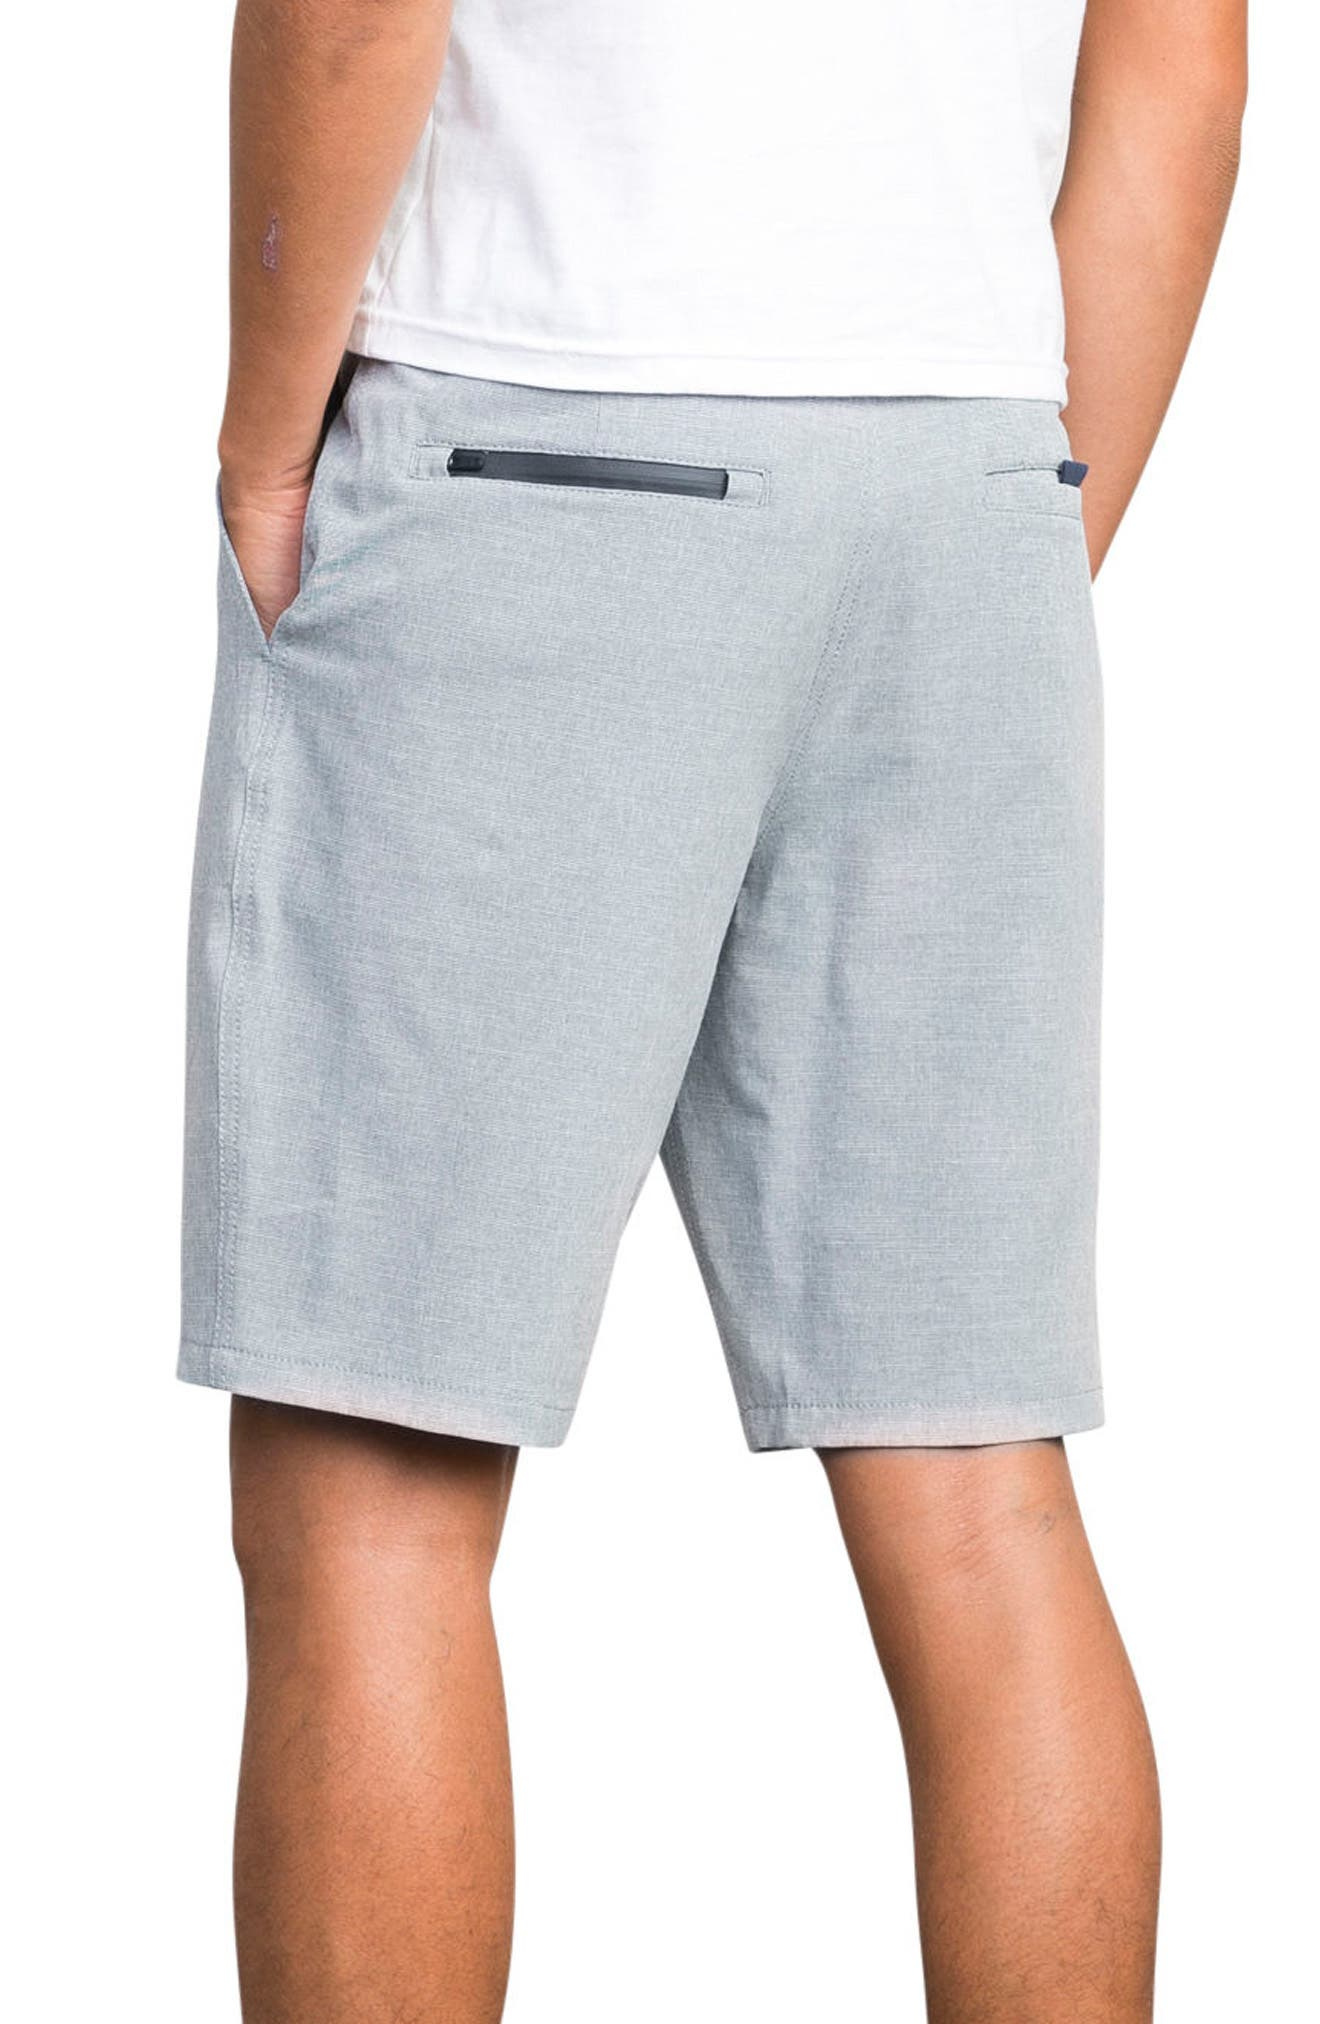 Balance Hybrid Shorts,                             Alternate thumbnail 2, color,                             415